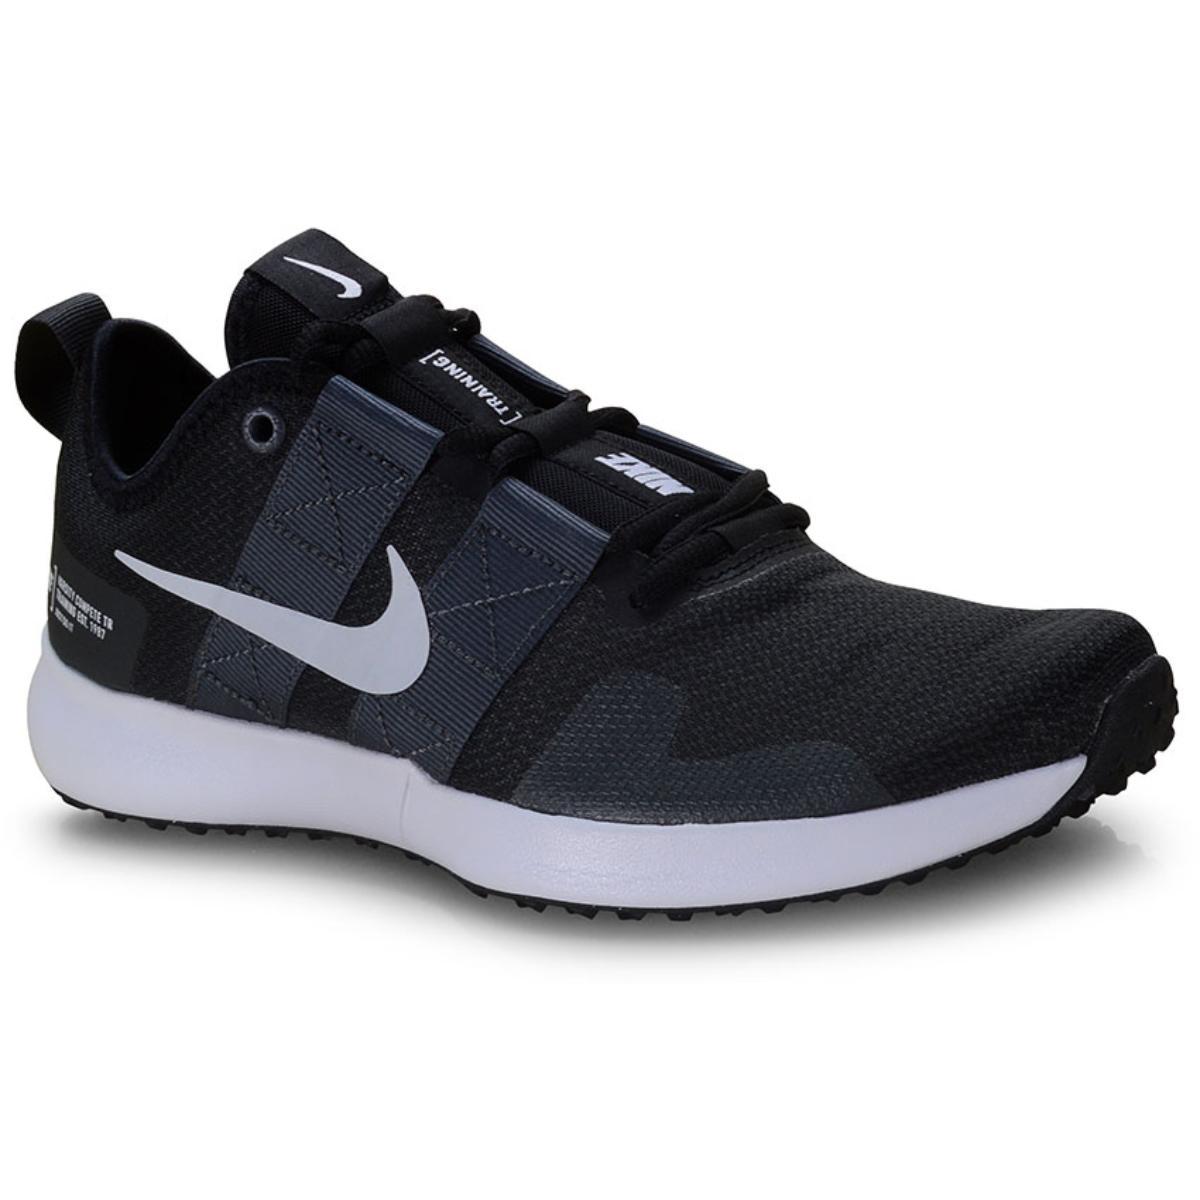 Tênis Masculino Nike At1239-003 Varsity Compete tr 2 Preto/branco